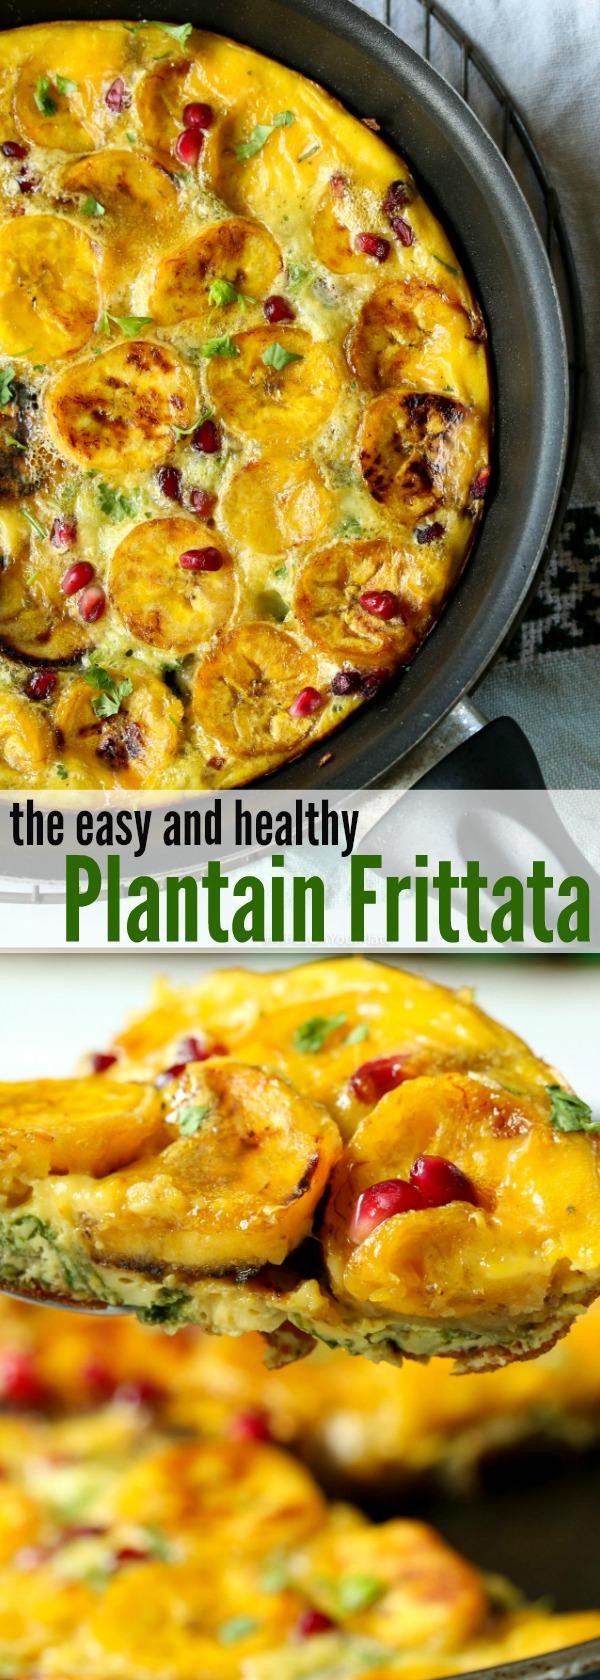 African Plantain Frittata